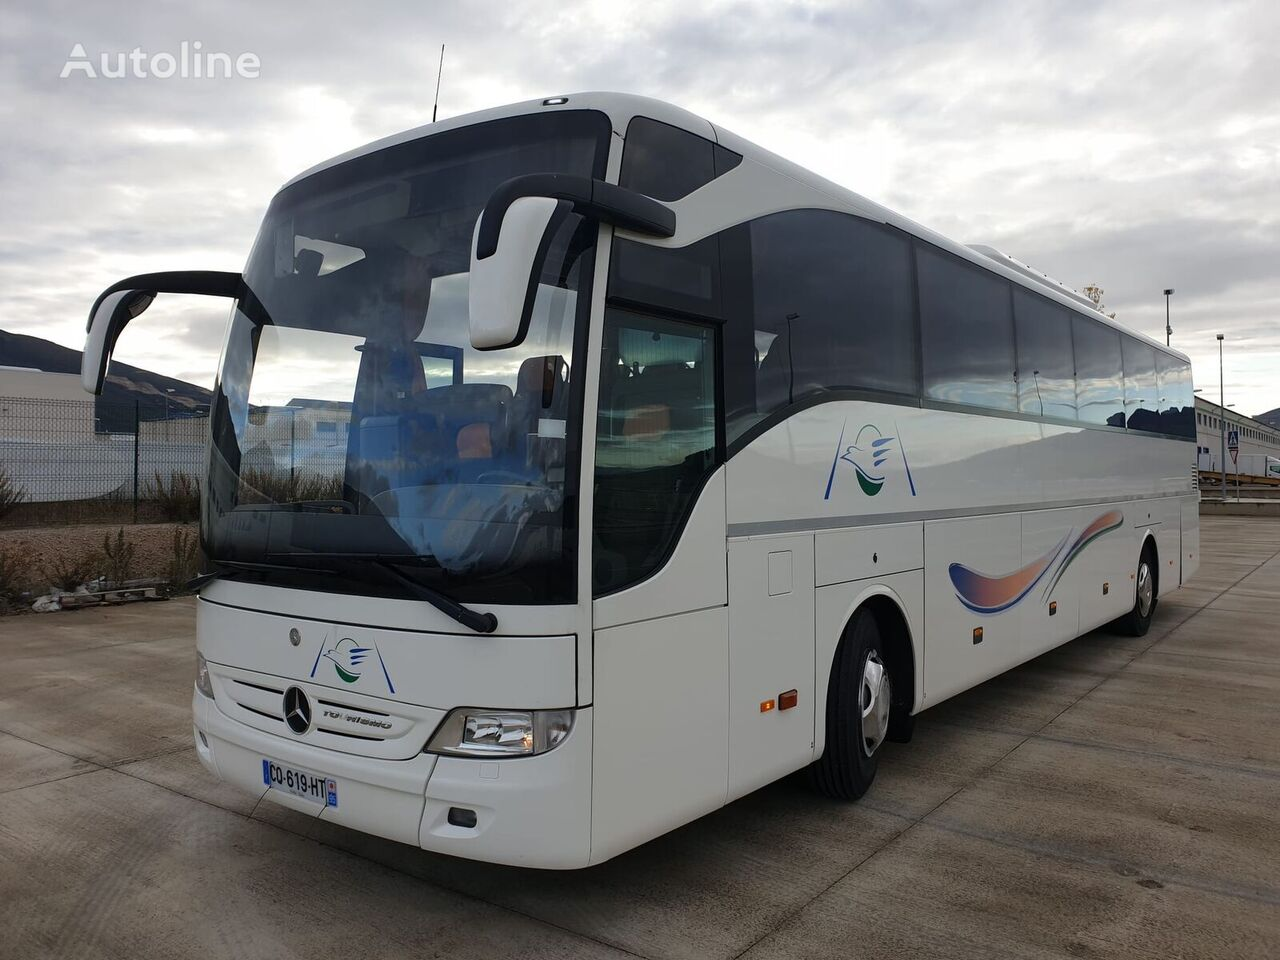 MERCEDES-BENZ tourismo  autobús de turismo